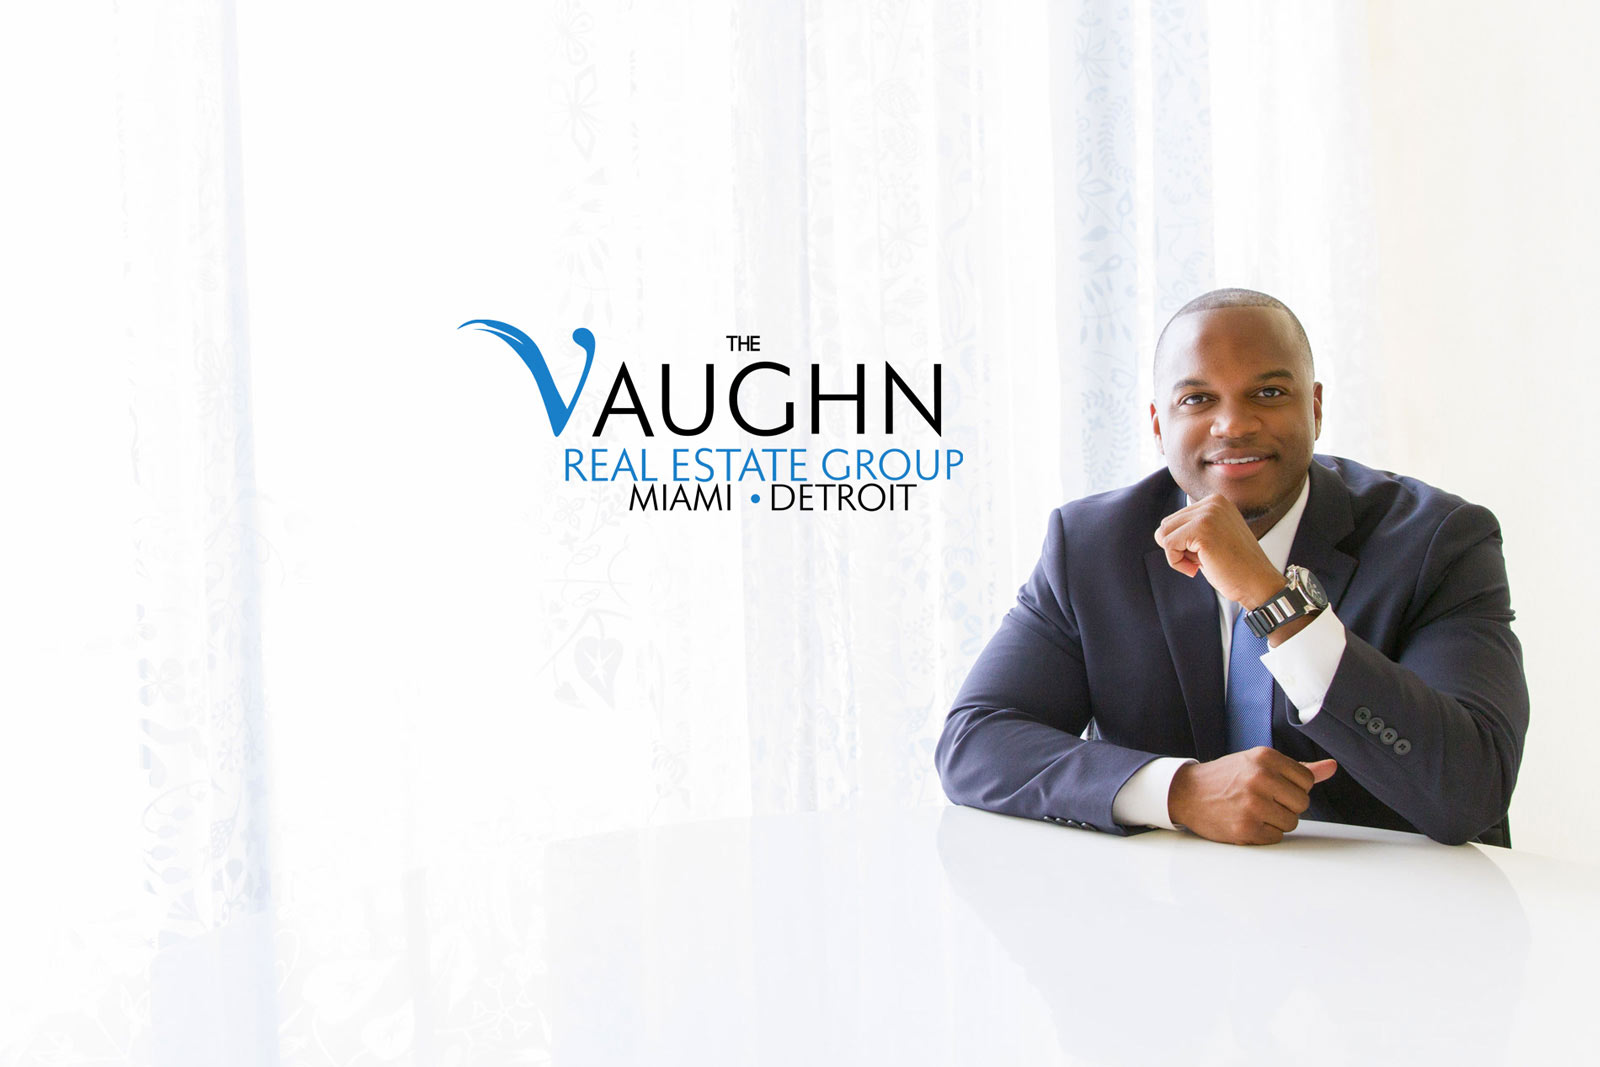 Miami Real Estate Agent Alex Vaughn of the Vaughn Real Estate Group